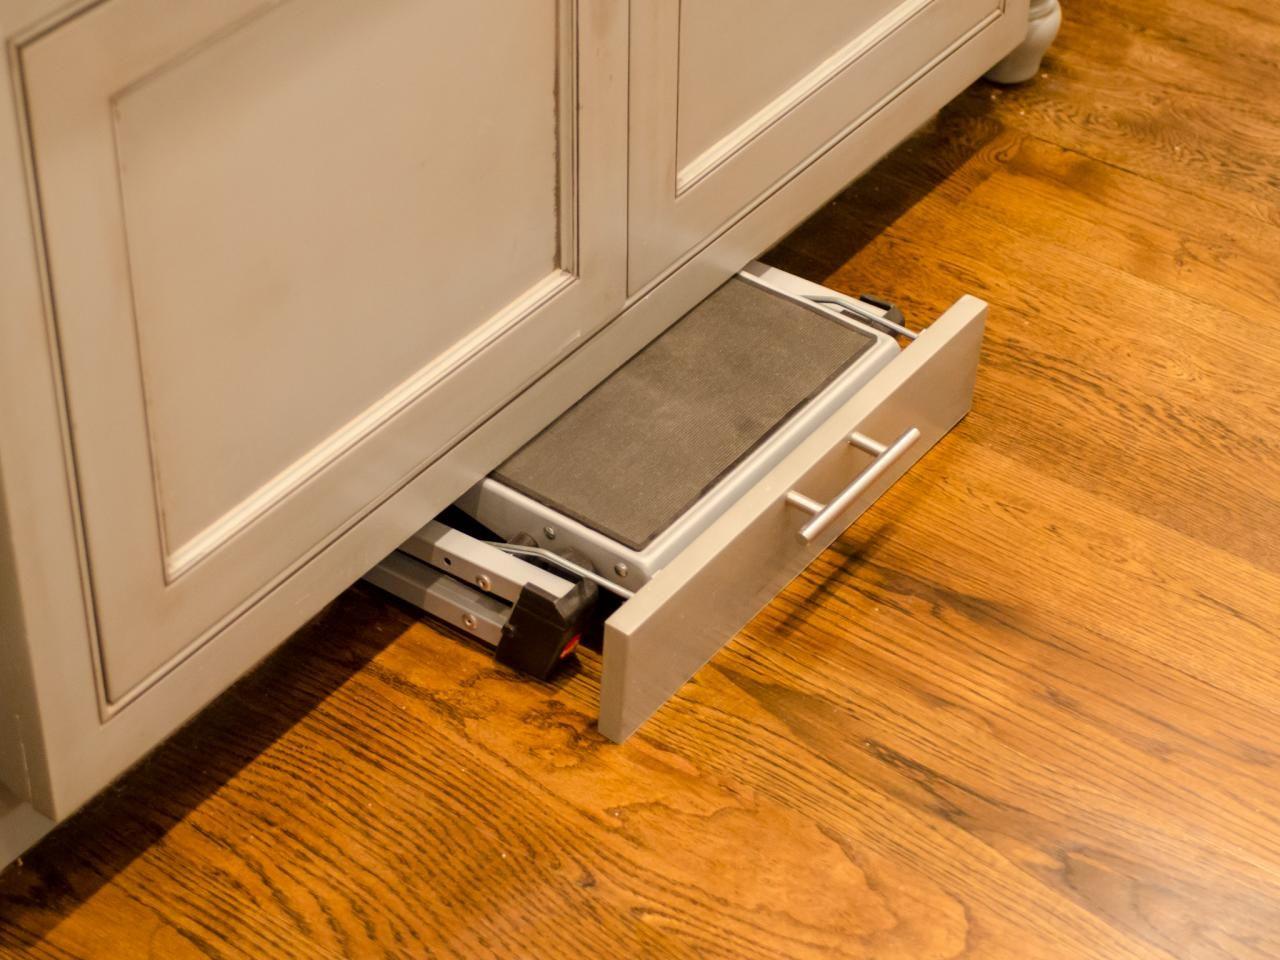 Remarkable Kitchen Layout Design Ideas For The Home Kitchen Cabinet Machost Co Dining Chair Design Ideas Machostcouk